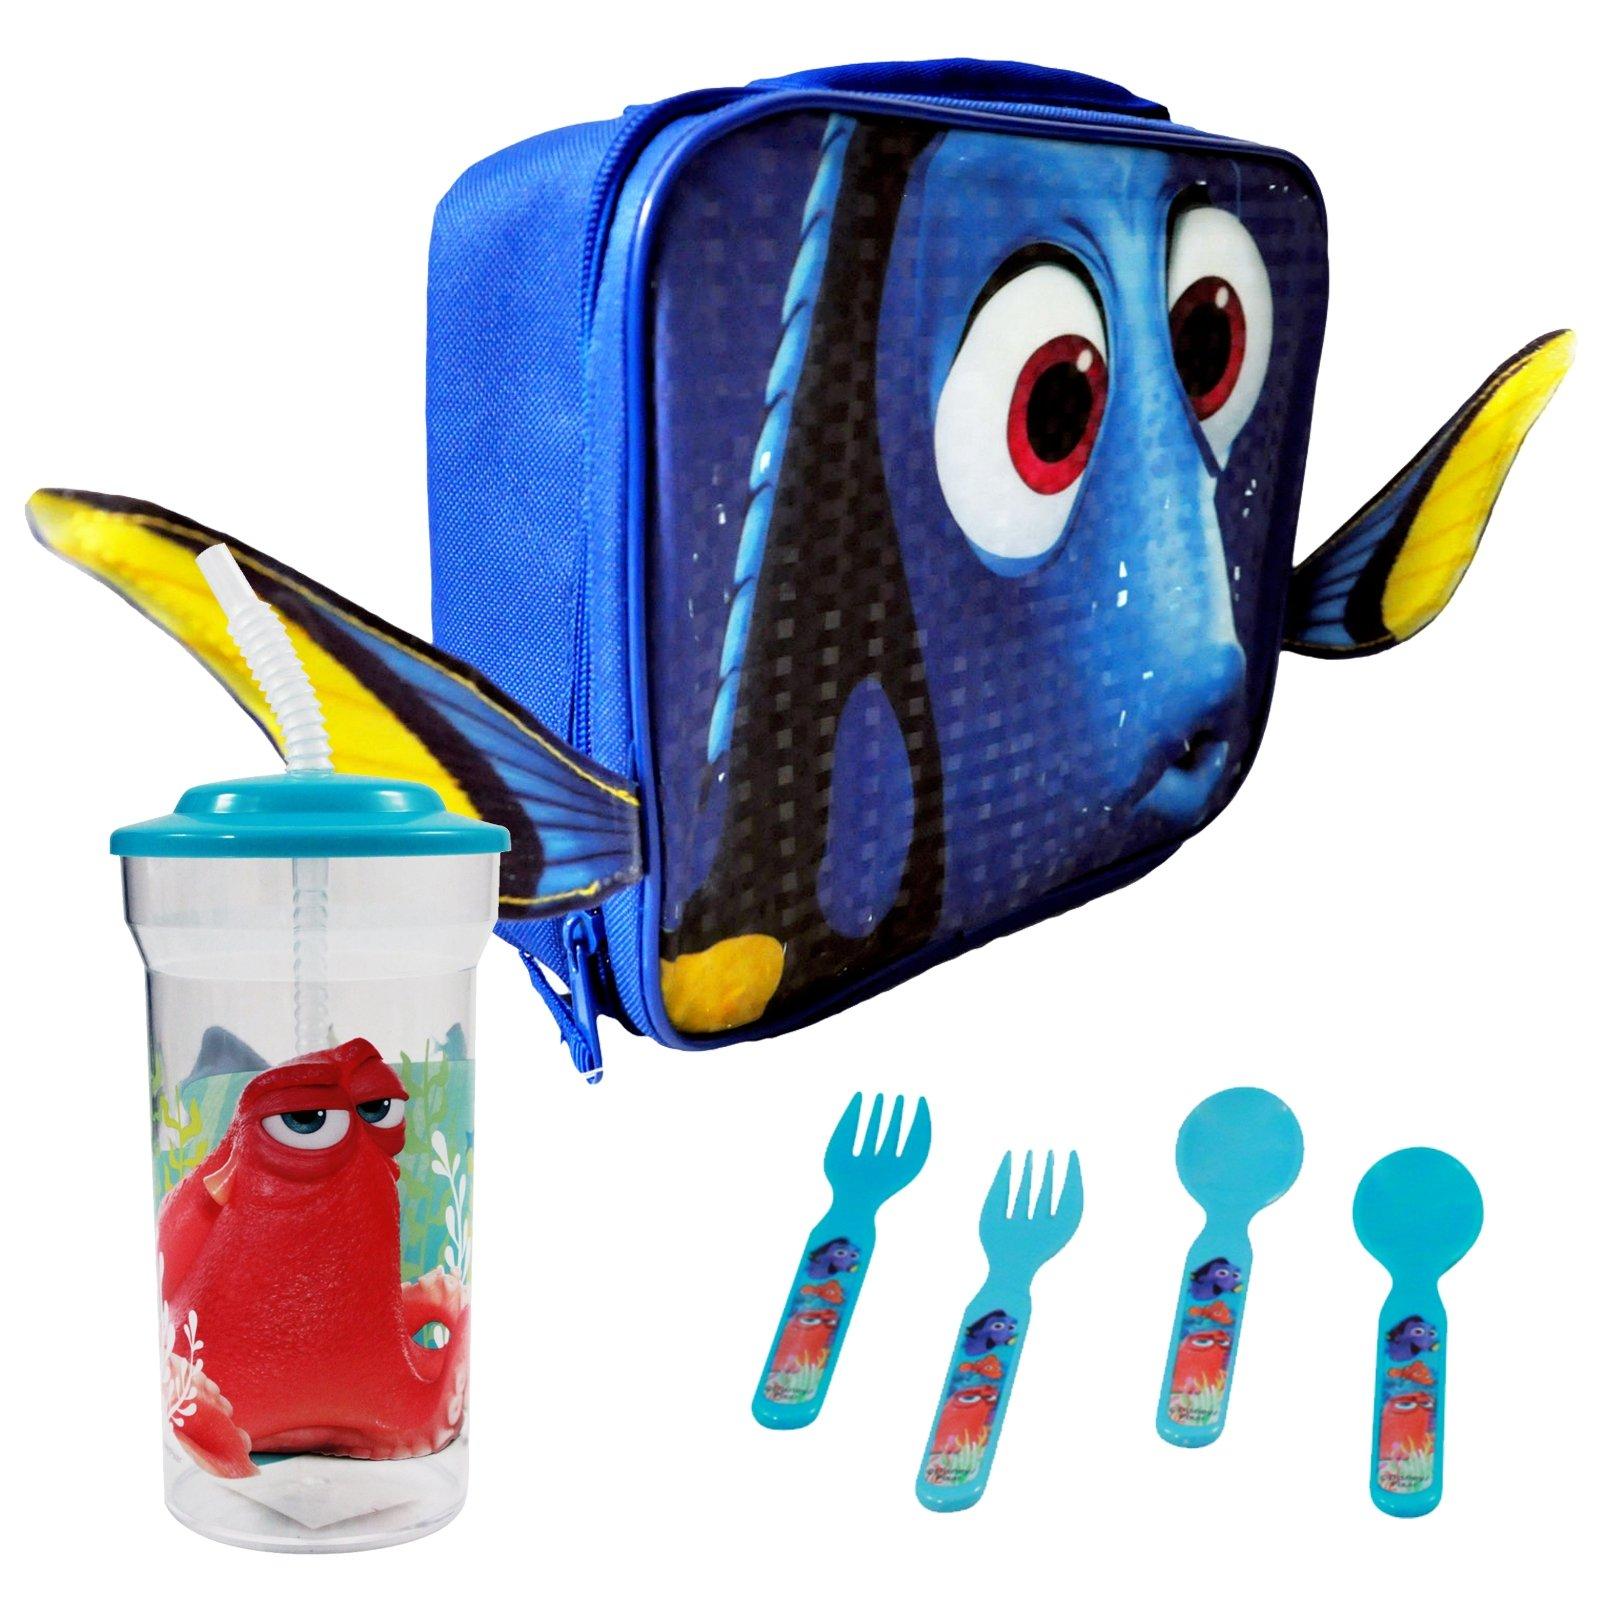 Disney Pixar Finding Dory Face Rectangle Lunch Bag Bundle with Utensils & Tumbler